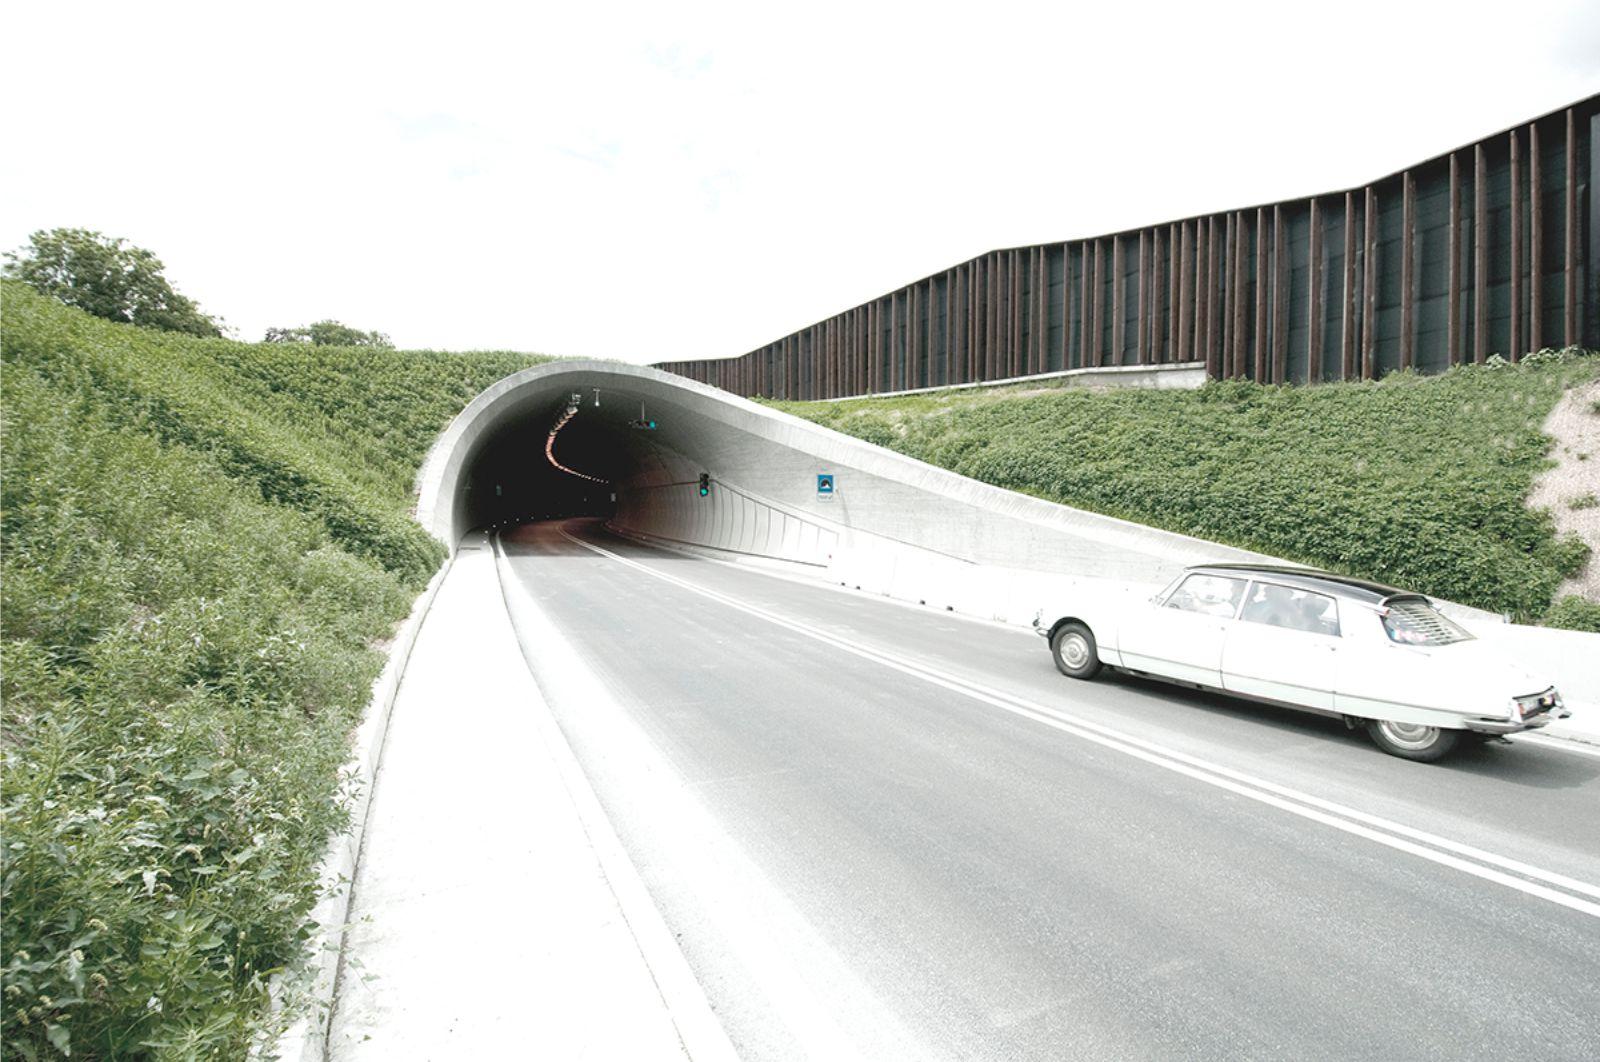 Central Juncture of Bressanone-Varna Ring Road